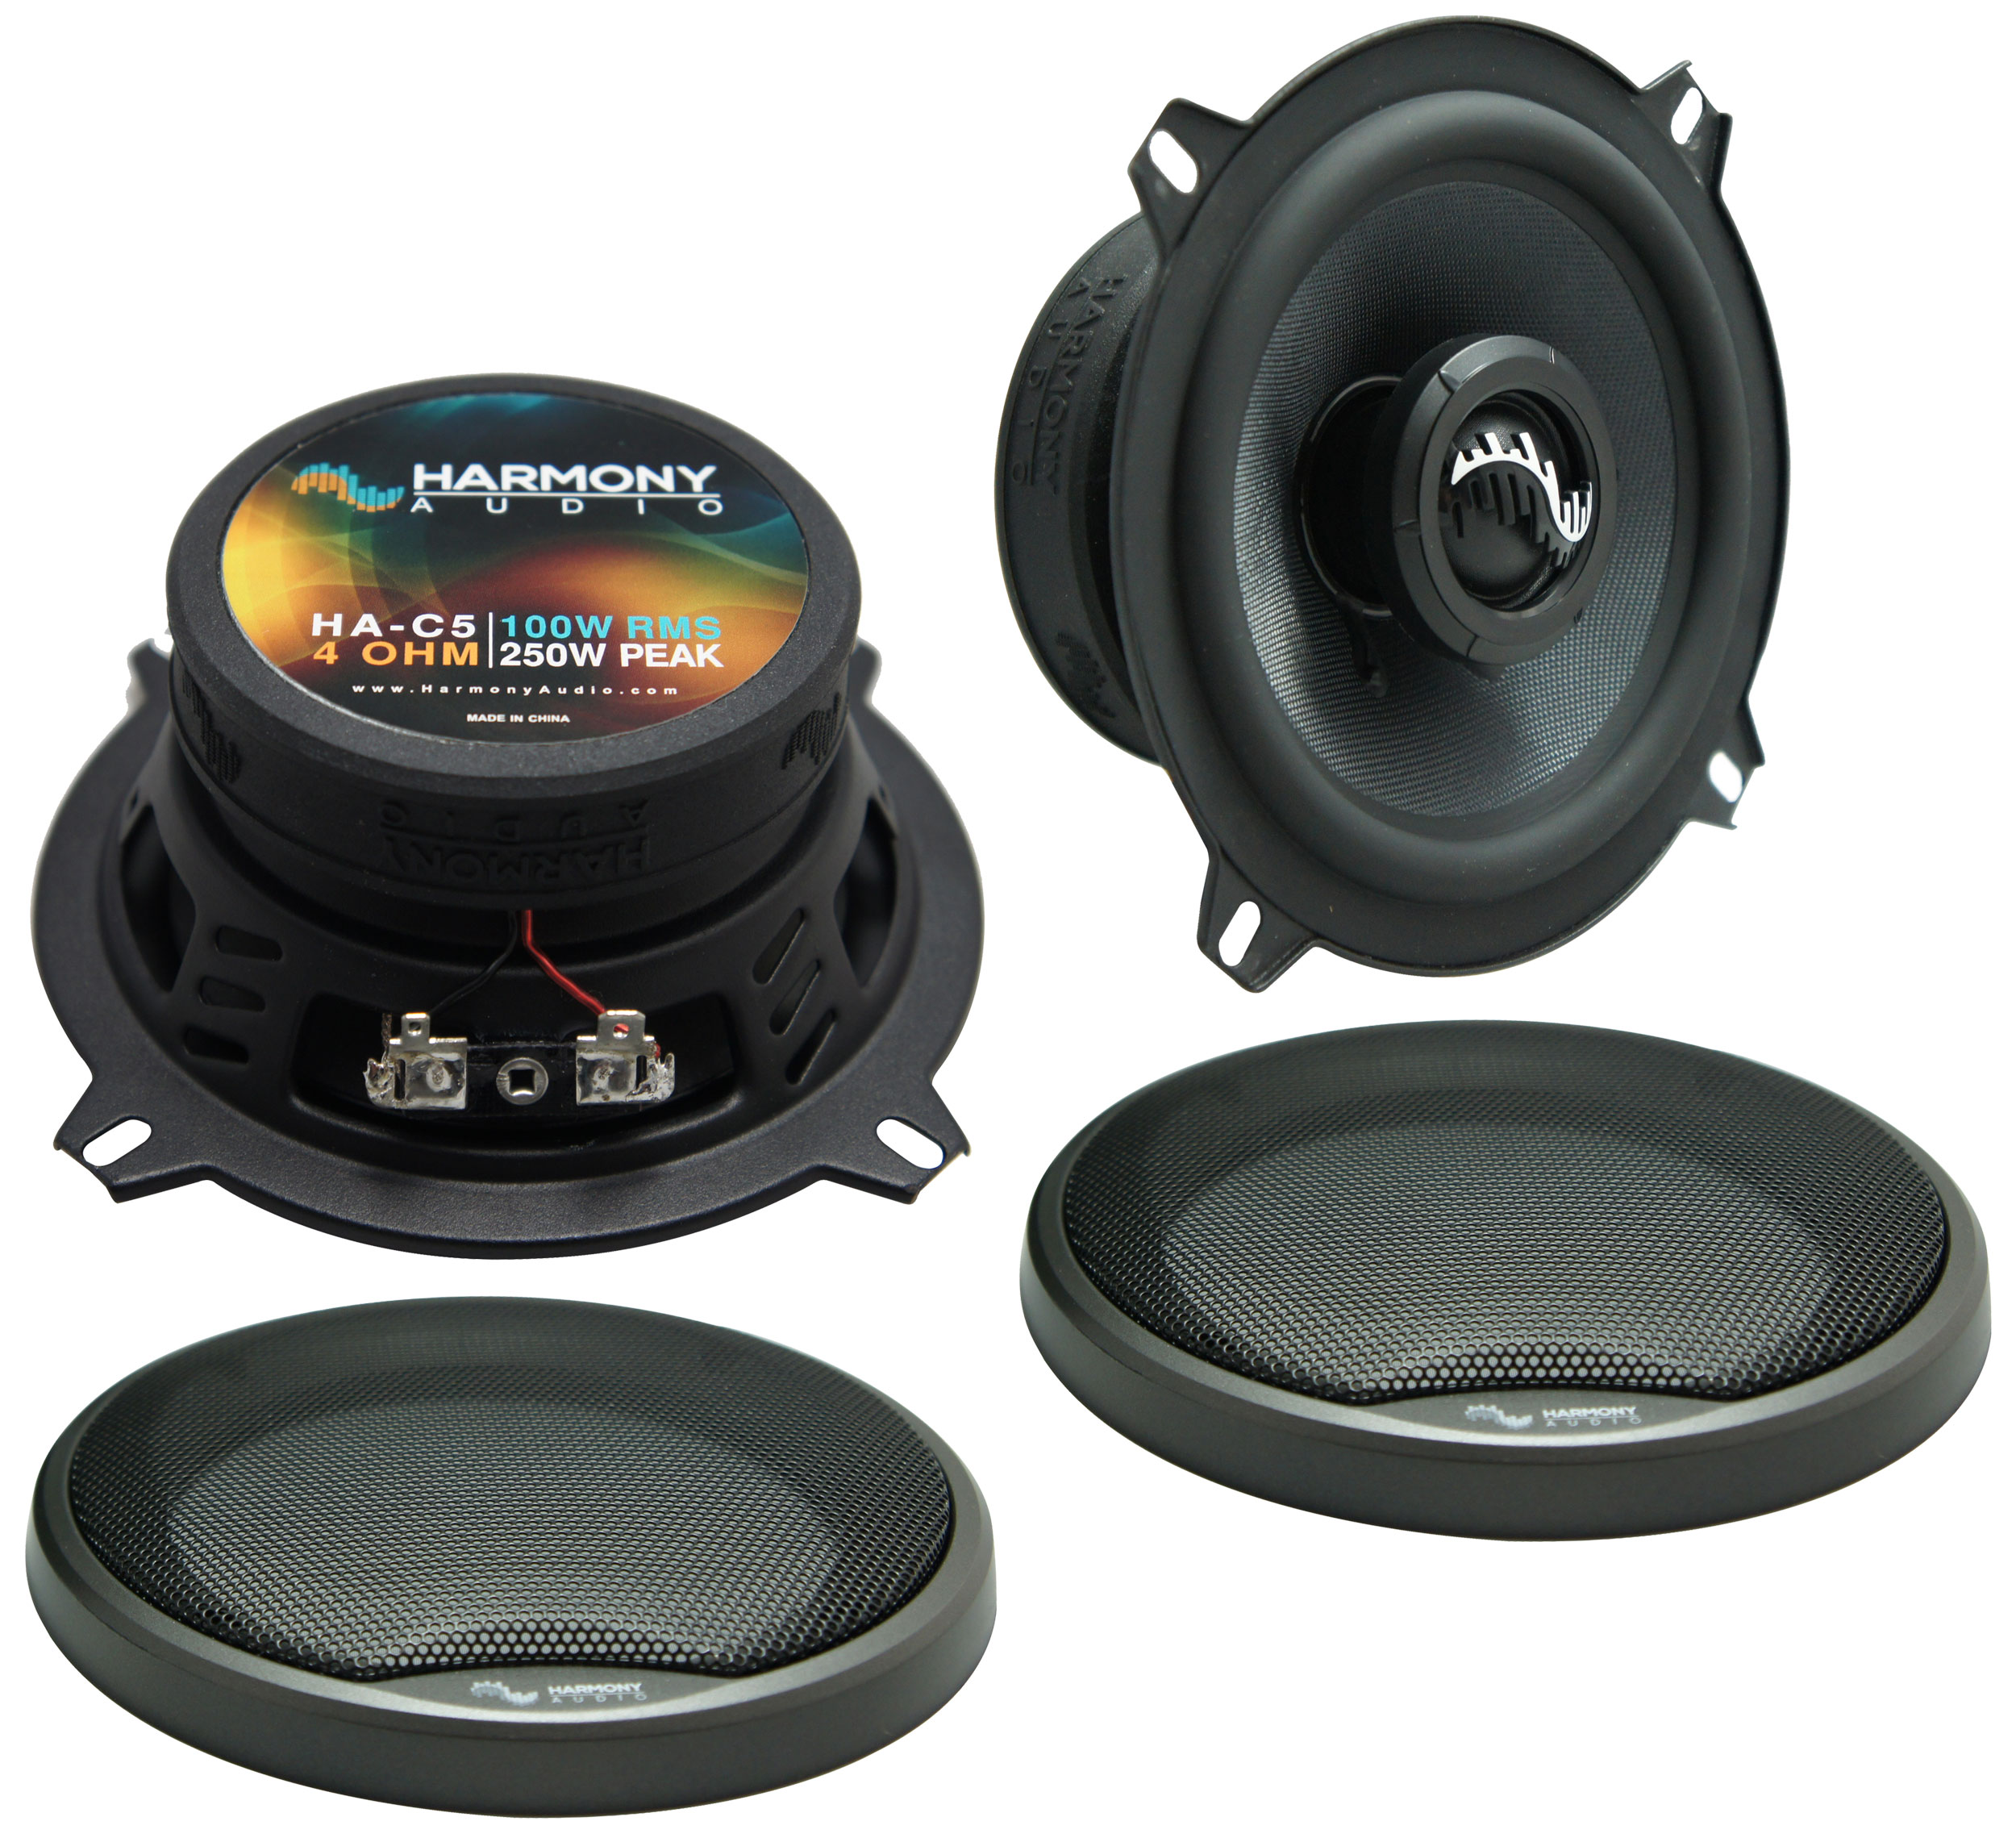 Fits BMW 3 Series 1999-2001 Rear Kick Panel Replacement Speaker HA-C5 Premium Speakers